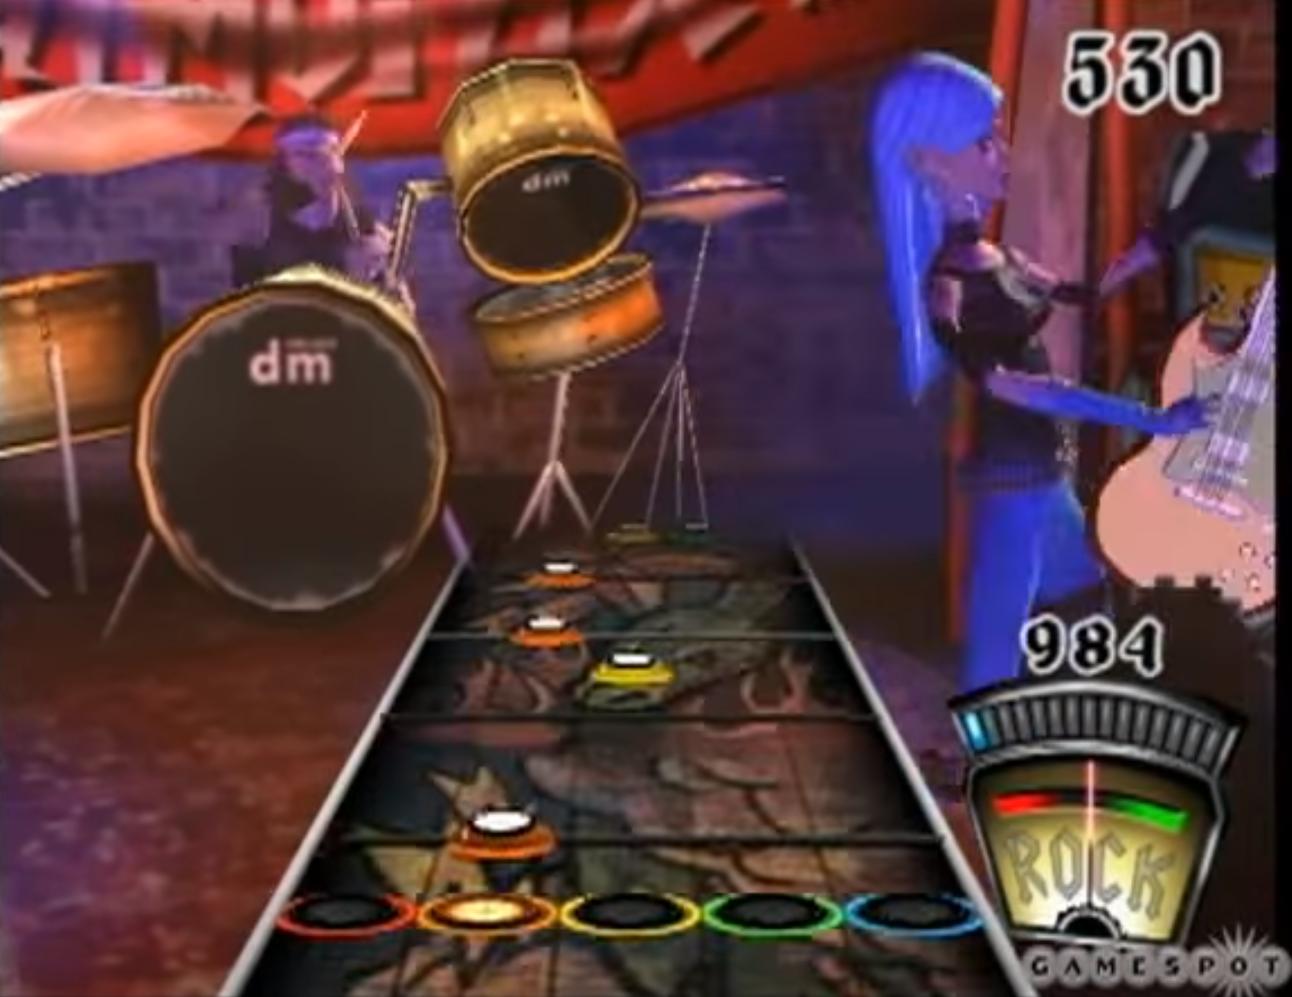 Guitar Hero 1 (PS2): Original Beta Build/Unused Beta Elements